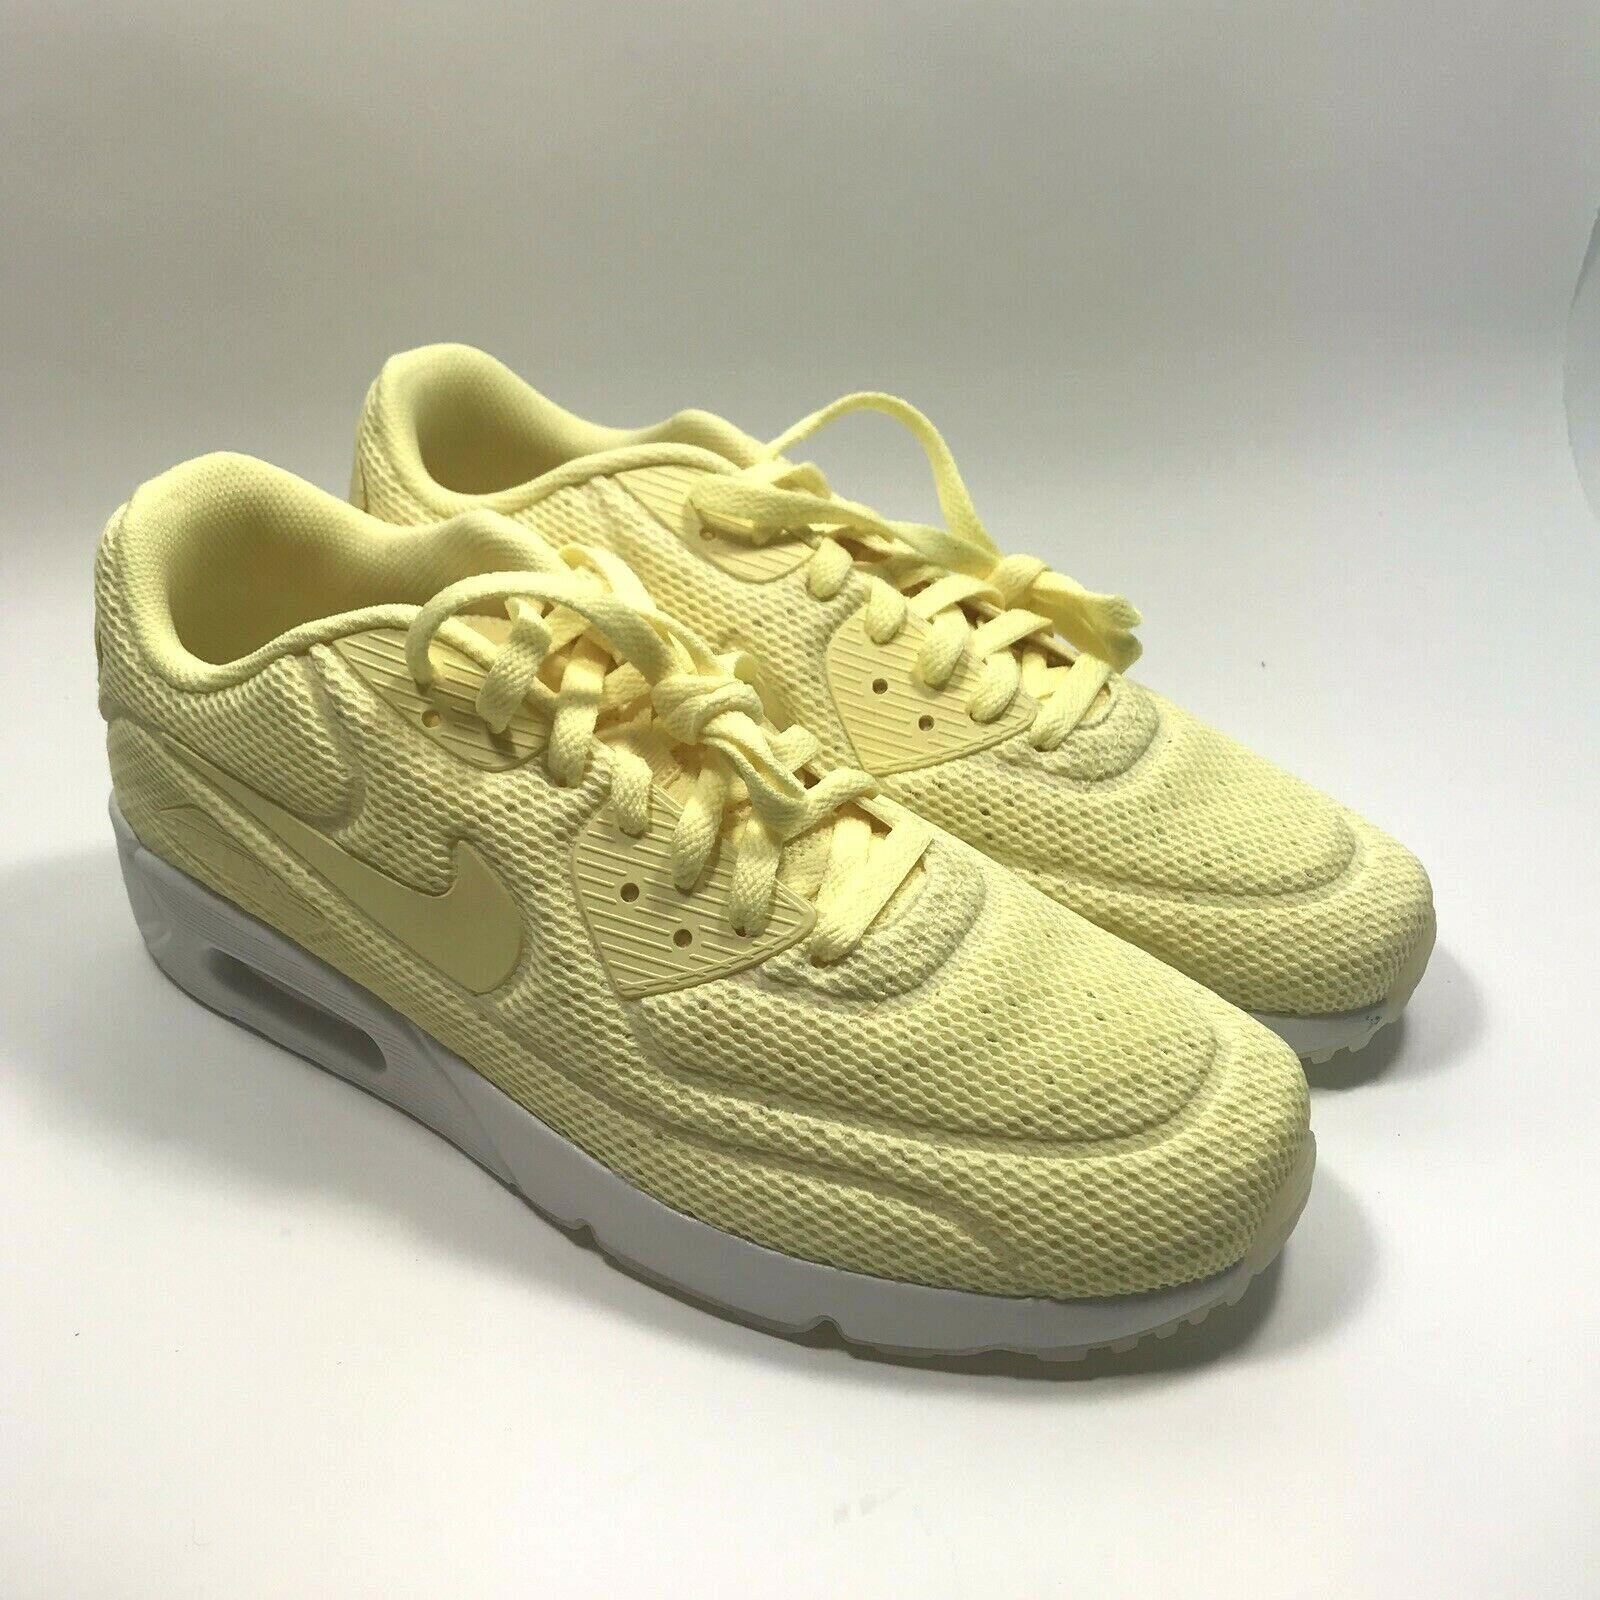 7d63397d4a Nike Air Max 90 Ultra 2.0 BR Lemon Chiffon 898010-700 Mens Size 9 ...